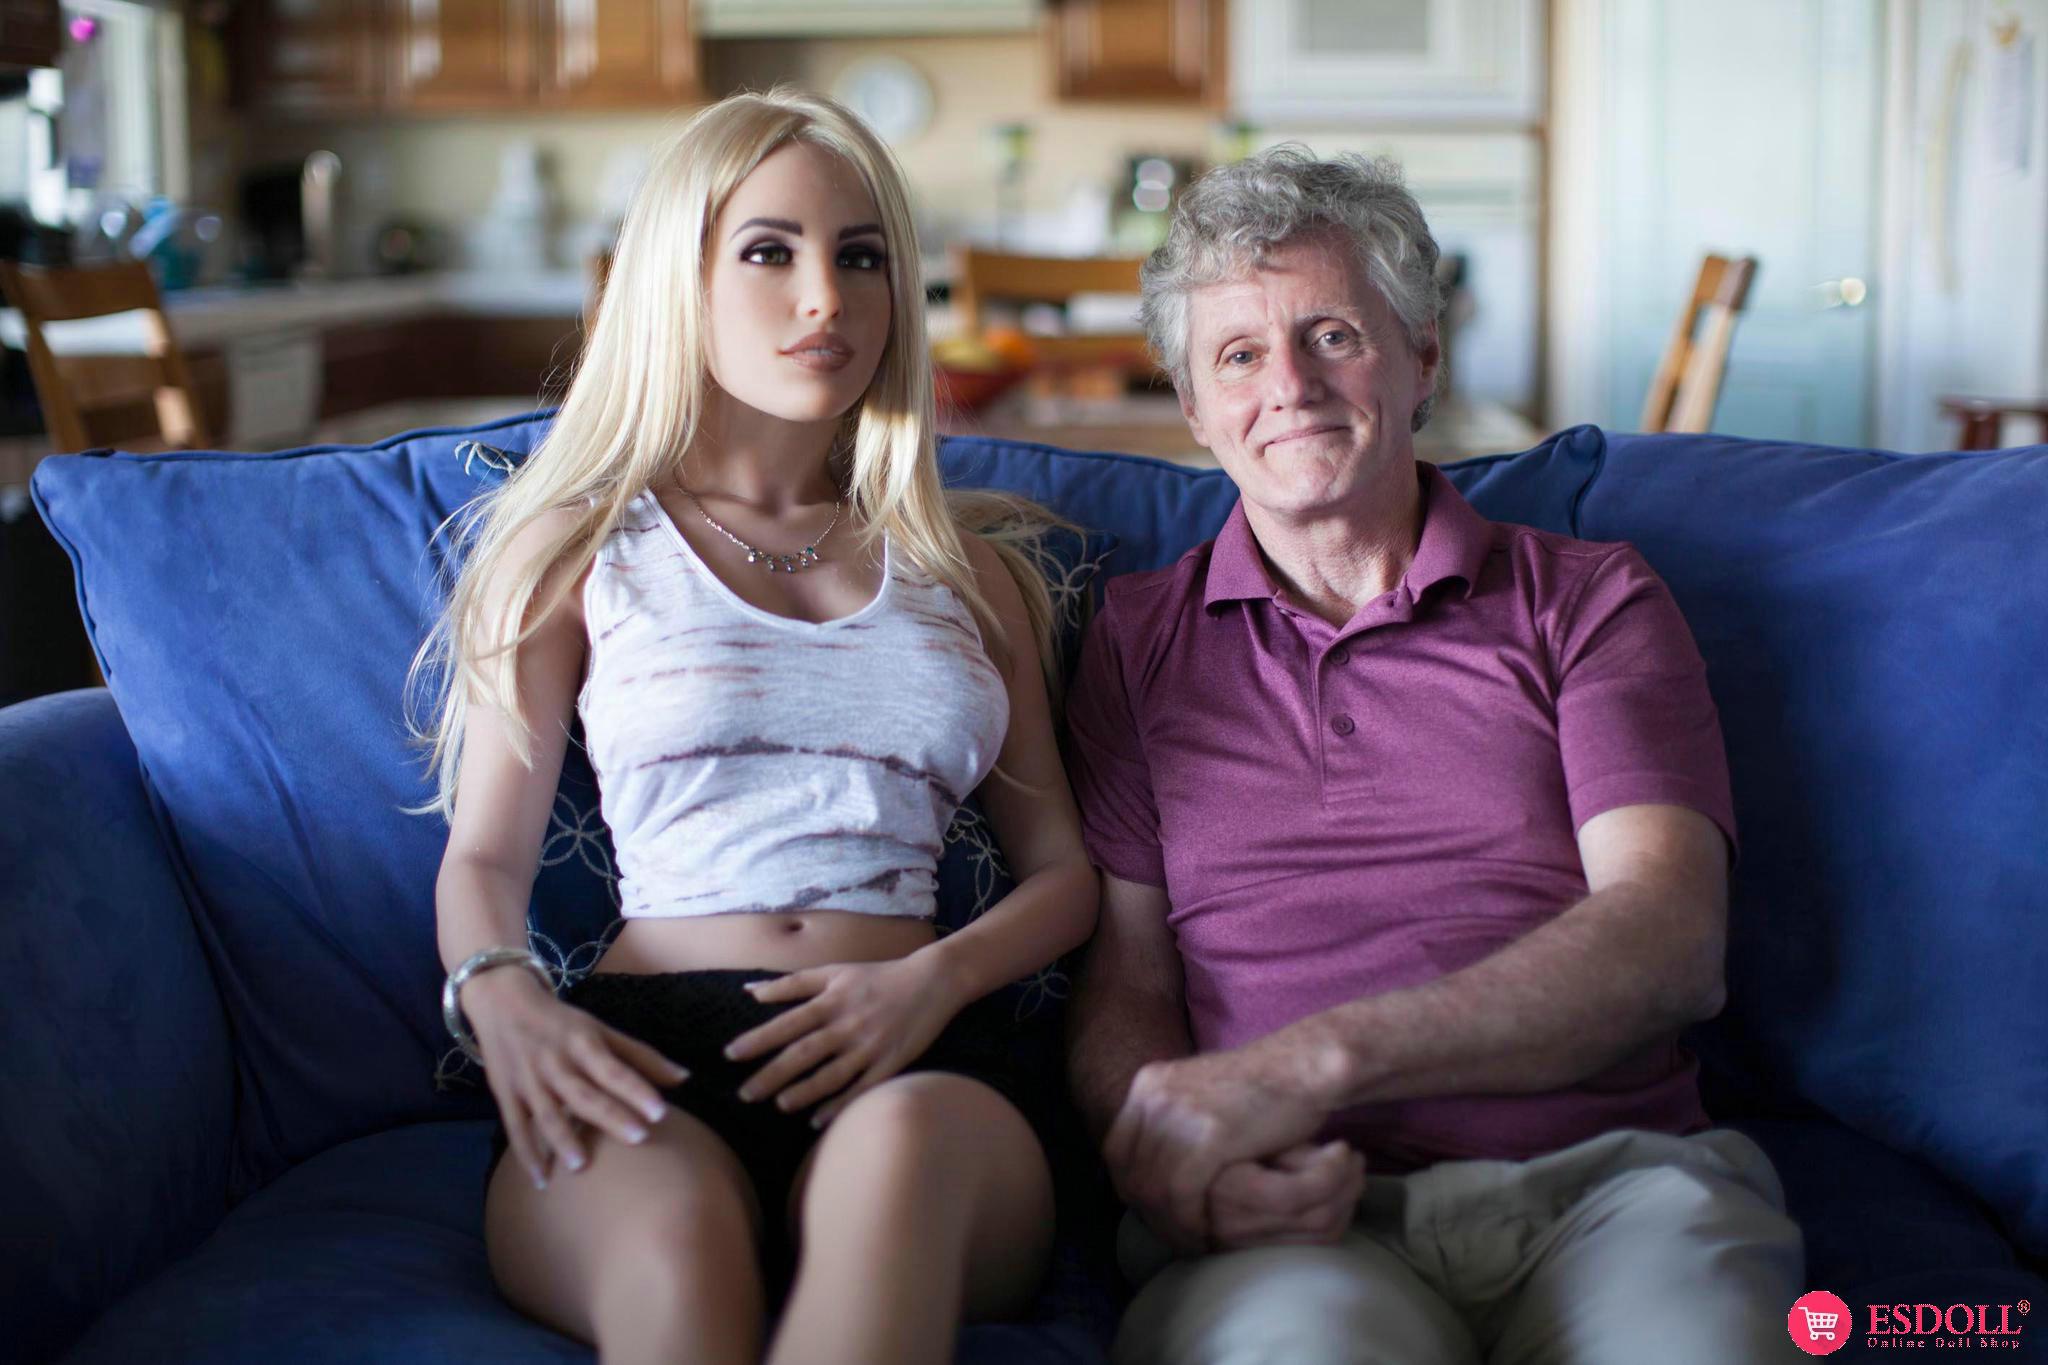 sex-dolls-health-benificat-lonely